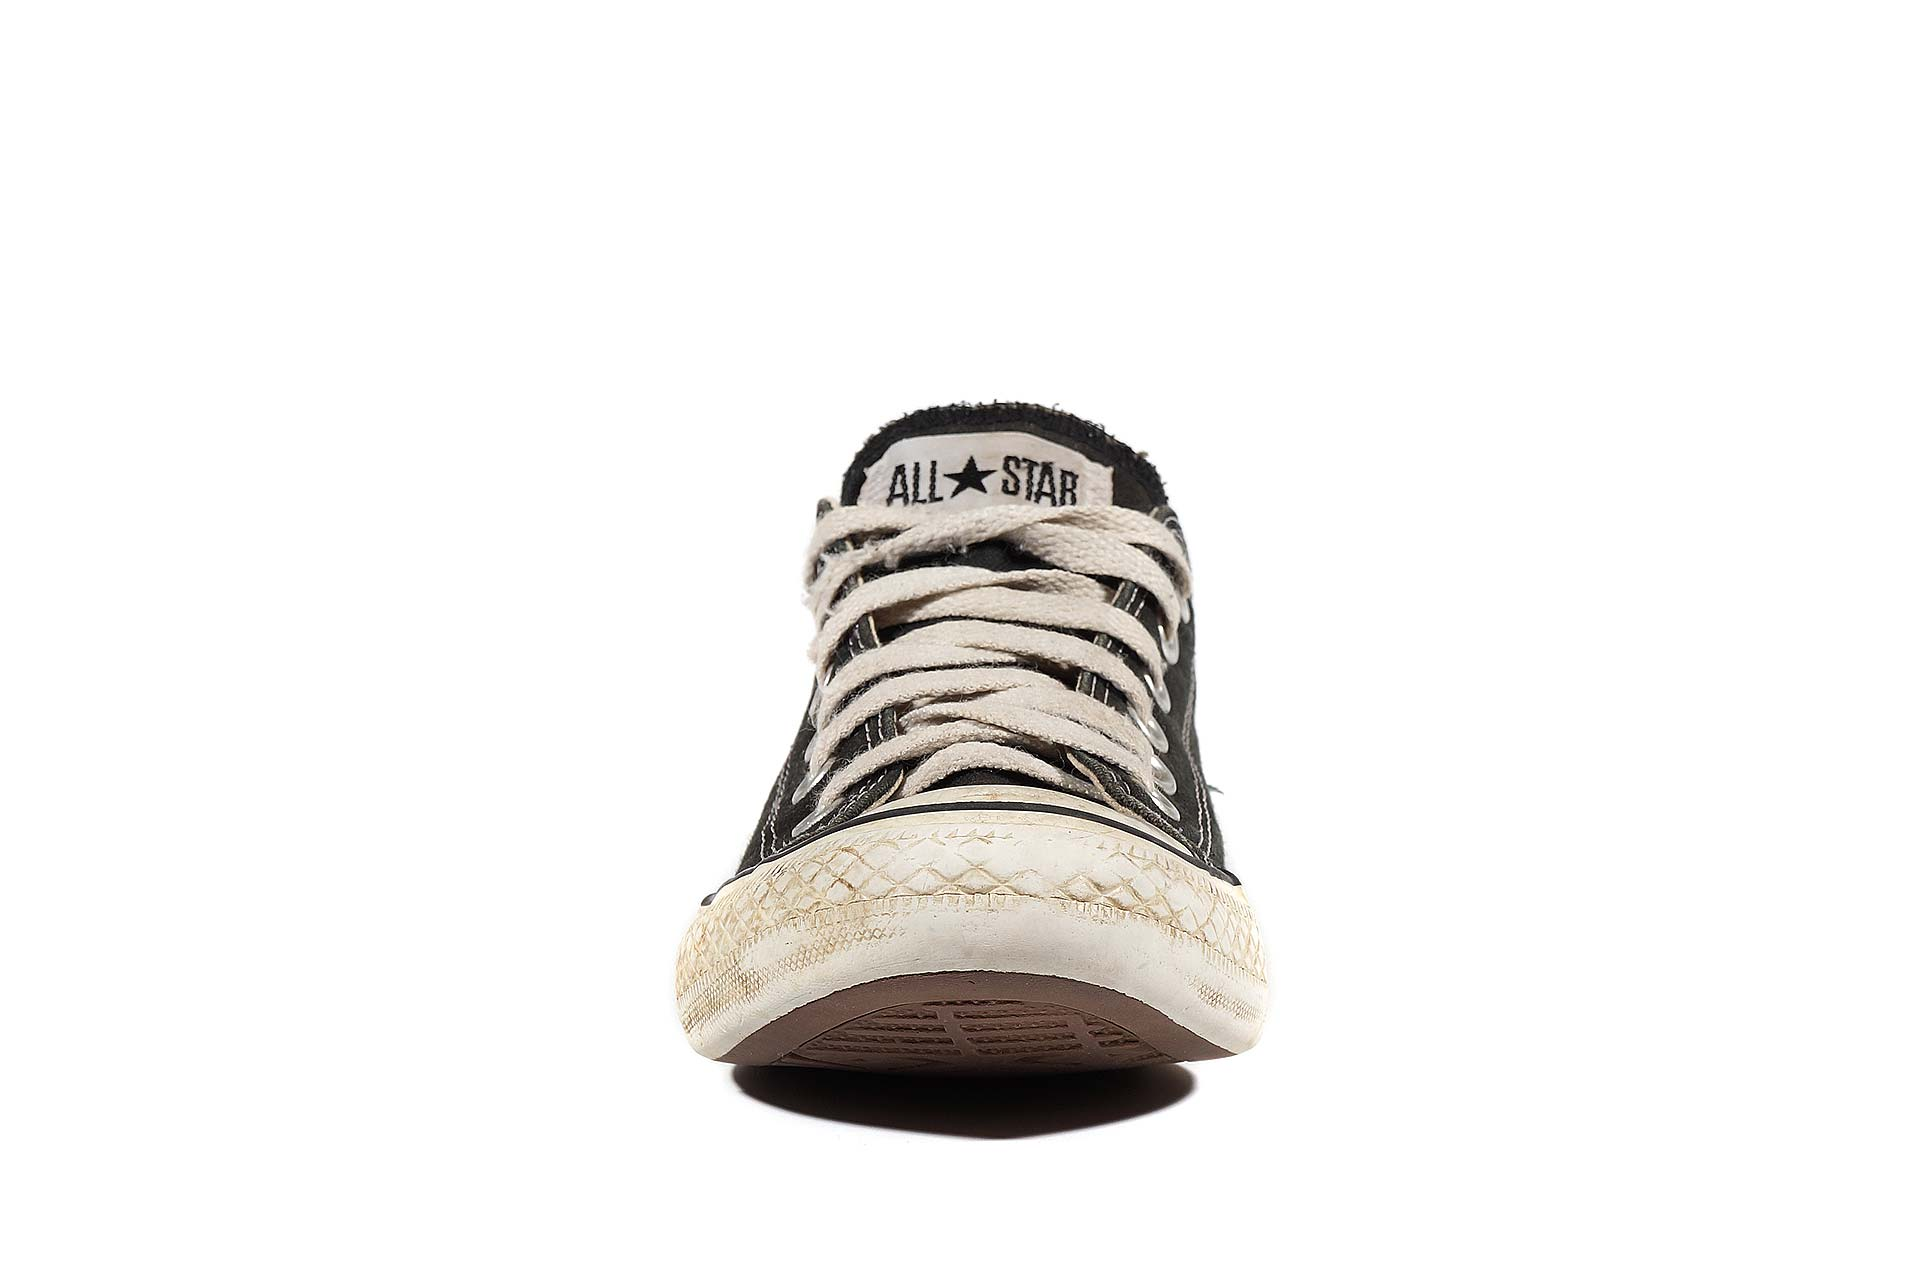 5e2660b6cf97 Converse Chuck Taylor All Star M9166 (00040-U) sneakers used buy ...